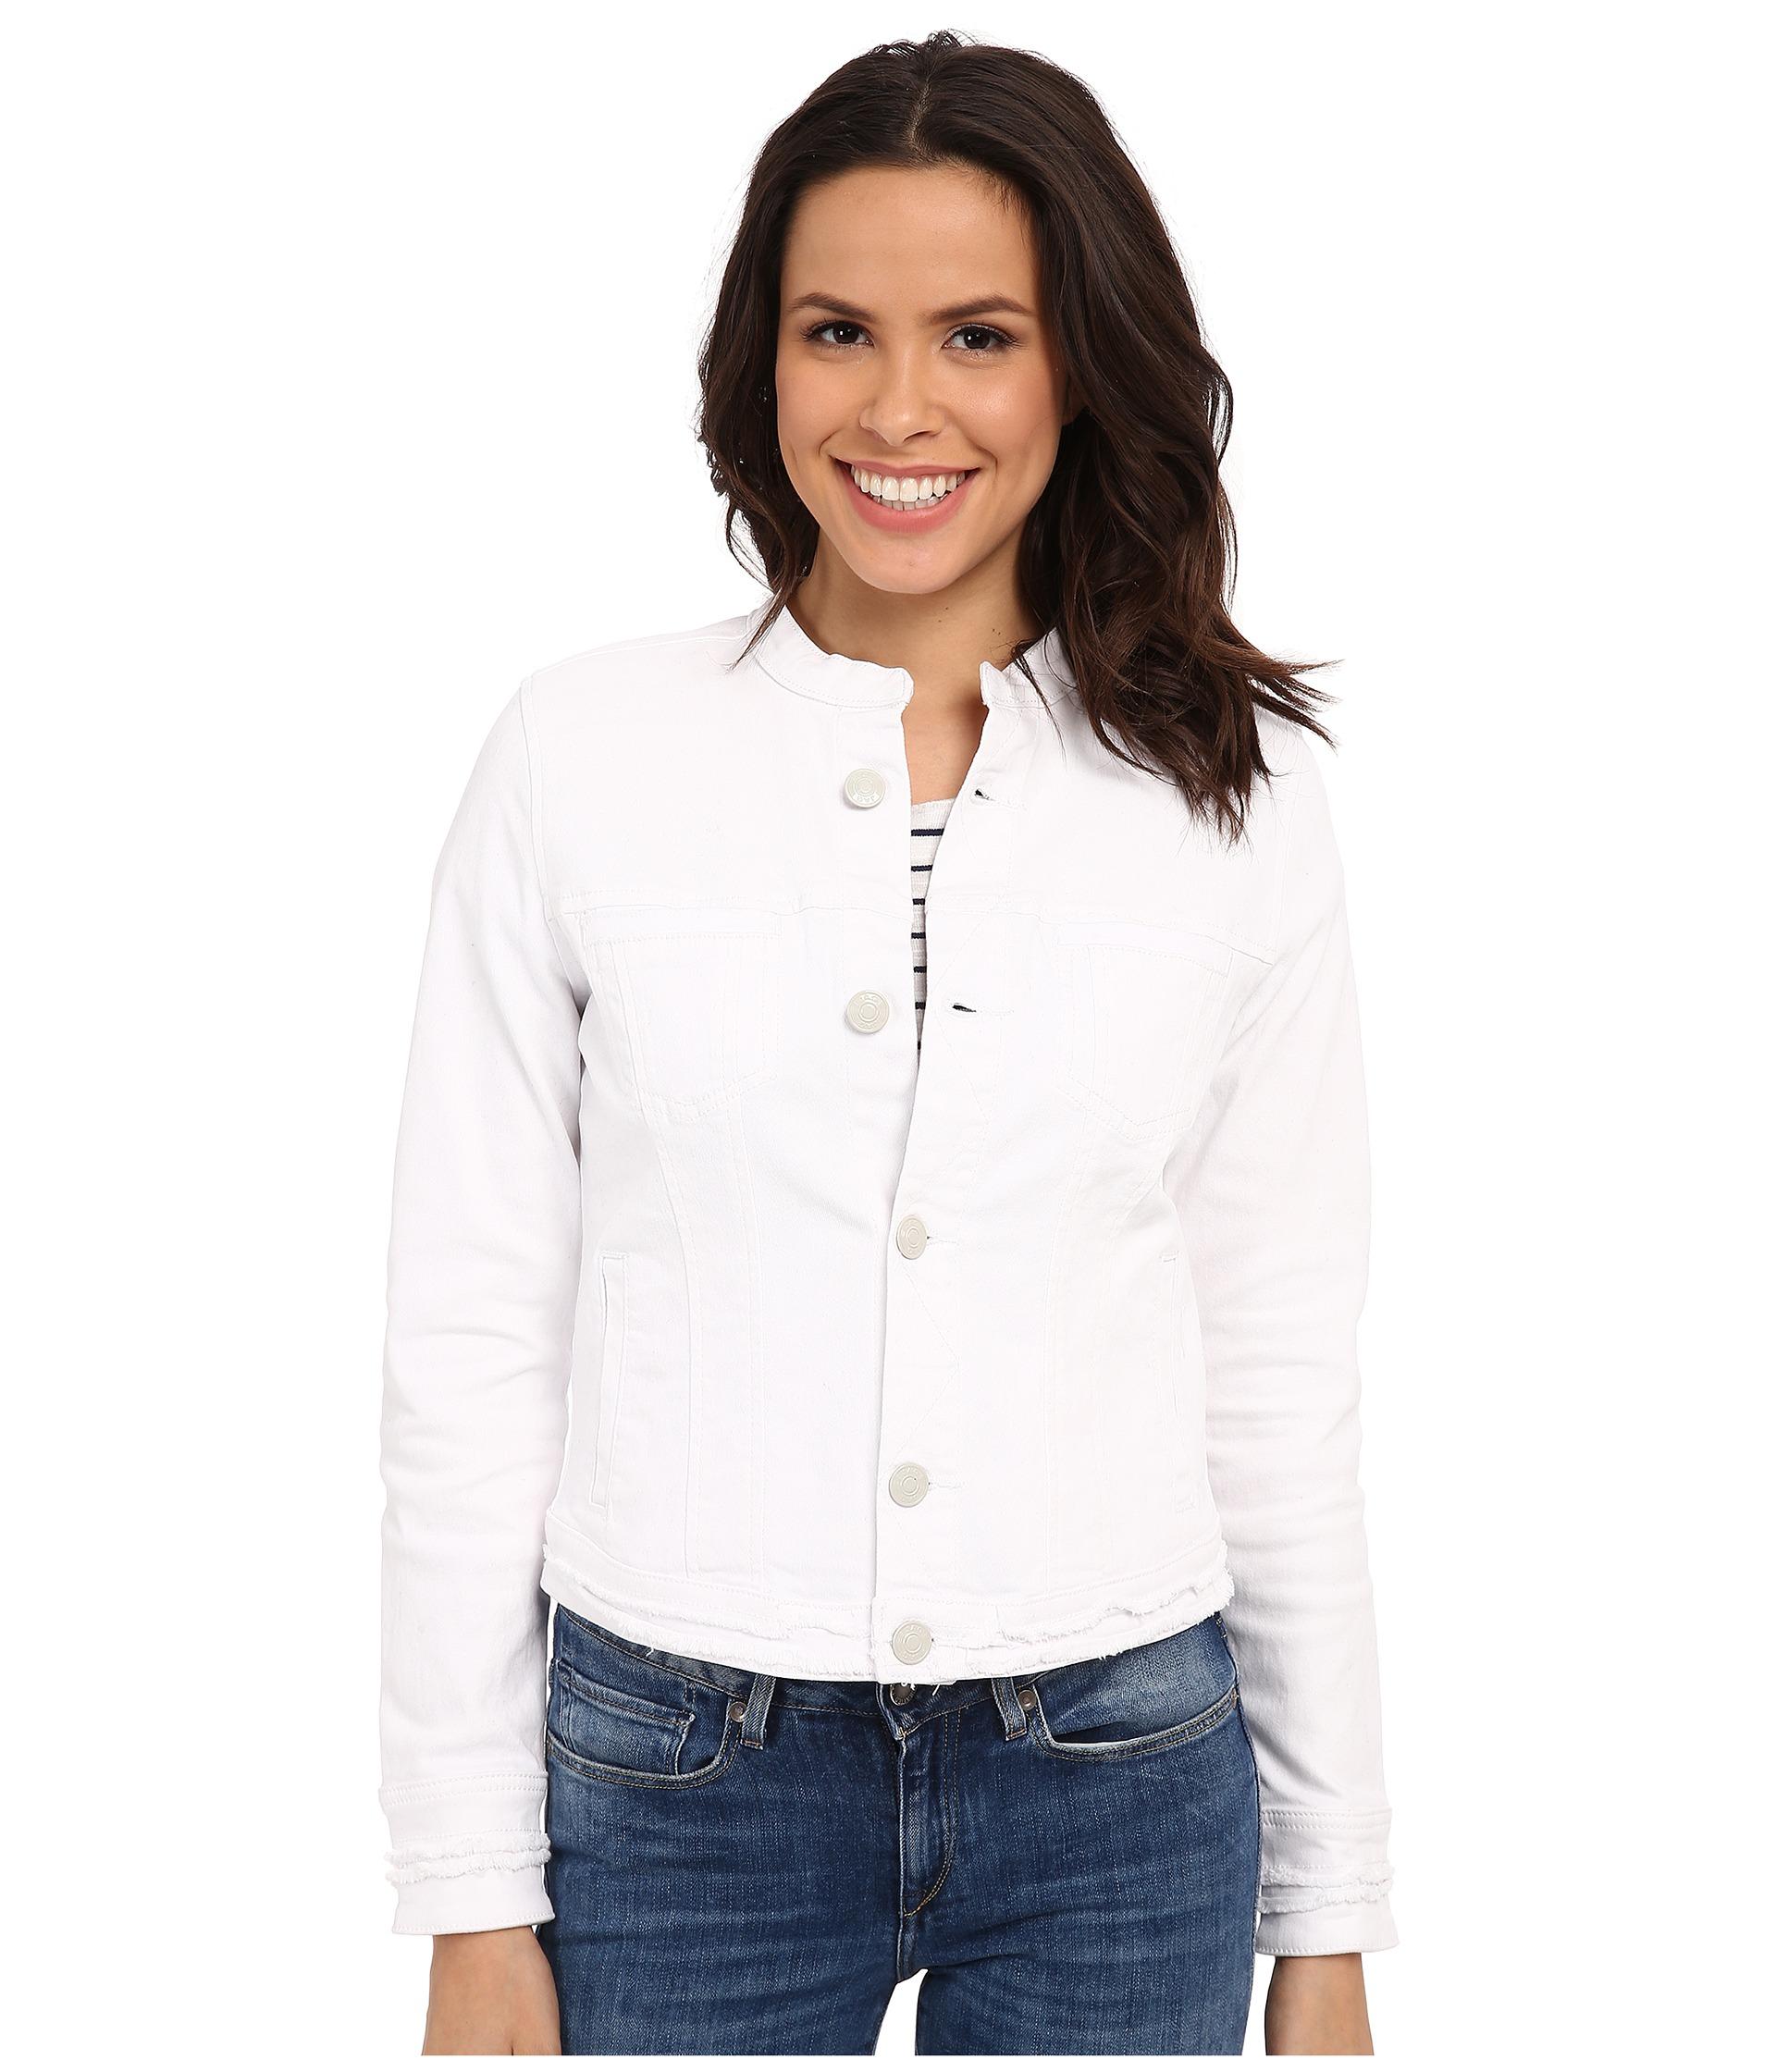 Jag Jeans Dixie Jacket in White Denim White - Zappos.com Free Shipping BOTH Ways